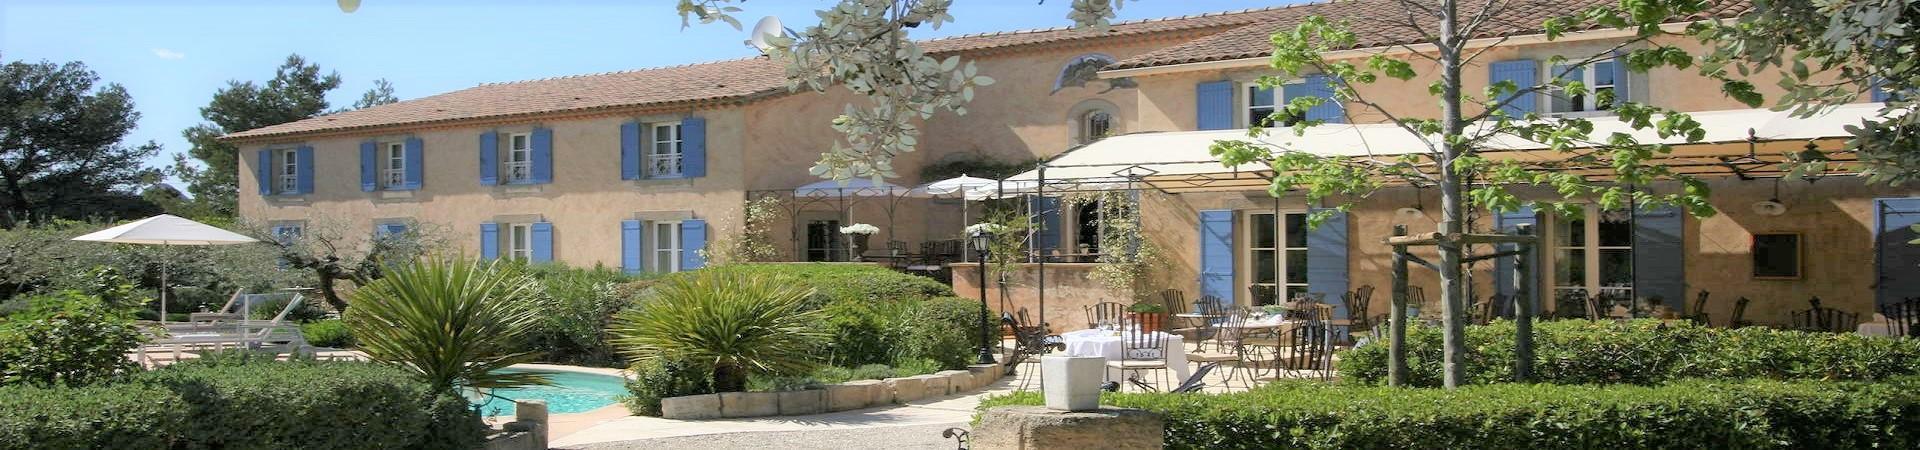 la-bastide-eygalieres-alpilles-provence-sud-seminaires-facade